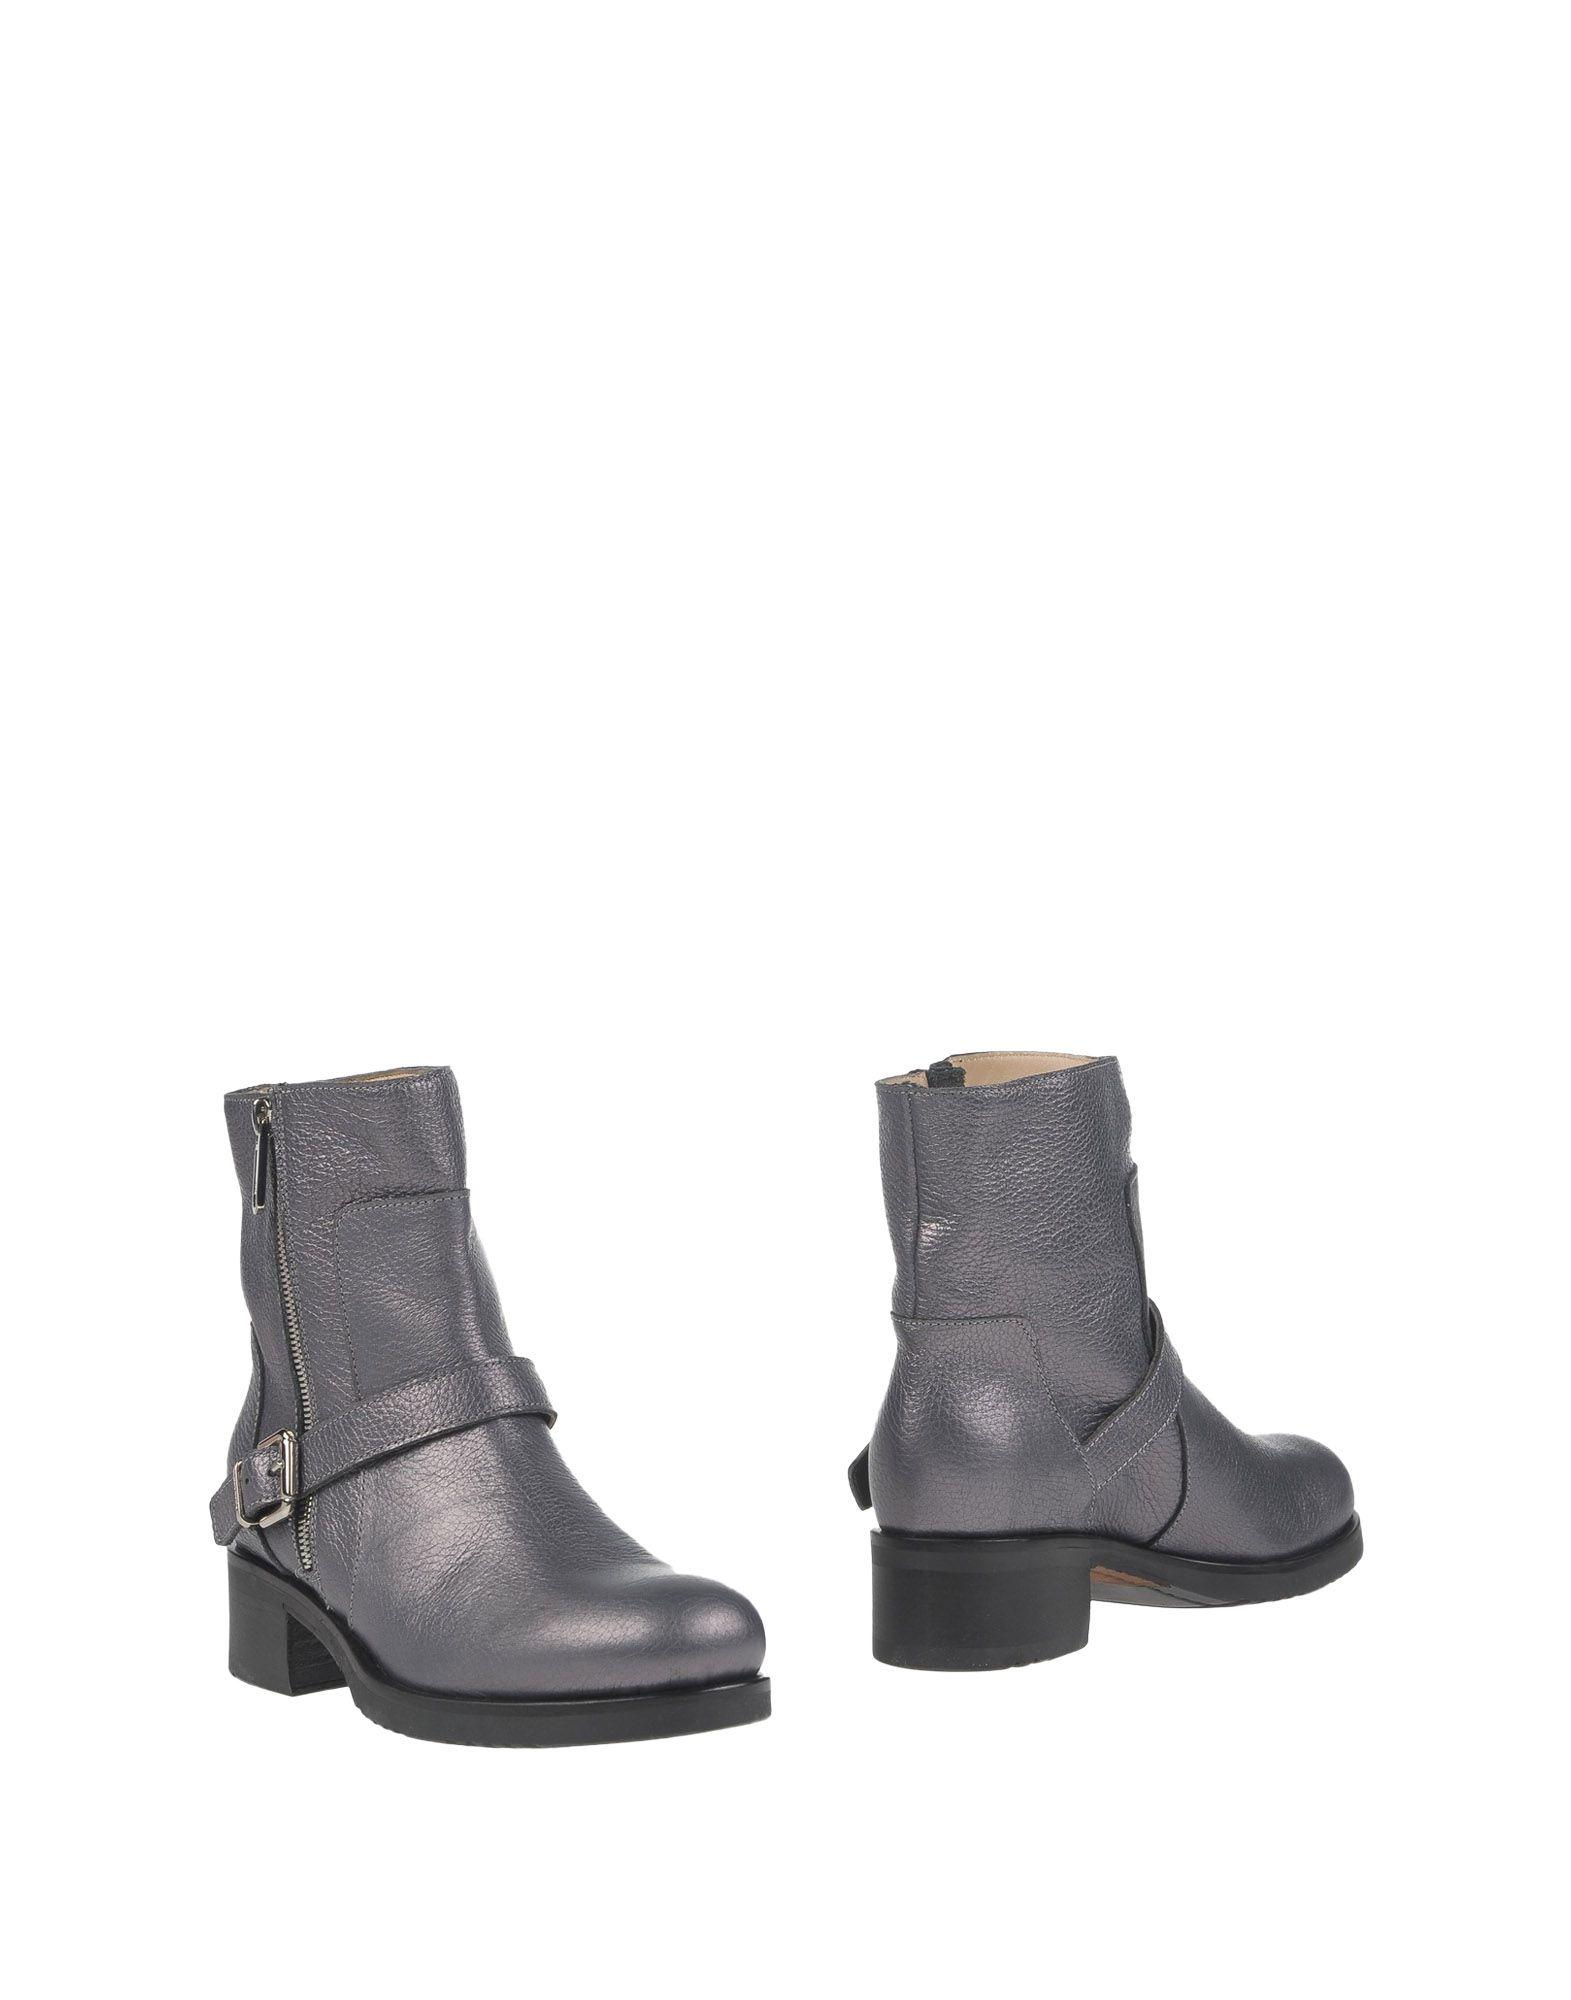 Liu •Jo Shoes Stiefelette Damen  11219289VJ Gute Qualität beliebte Schuhe